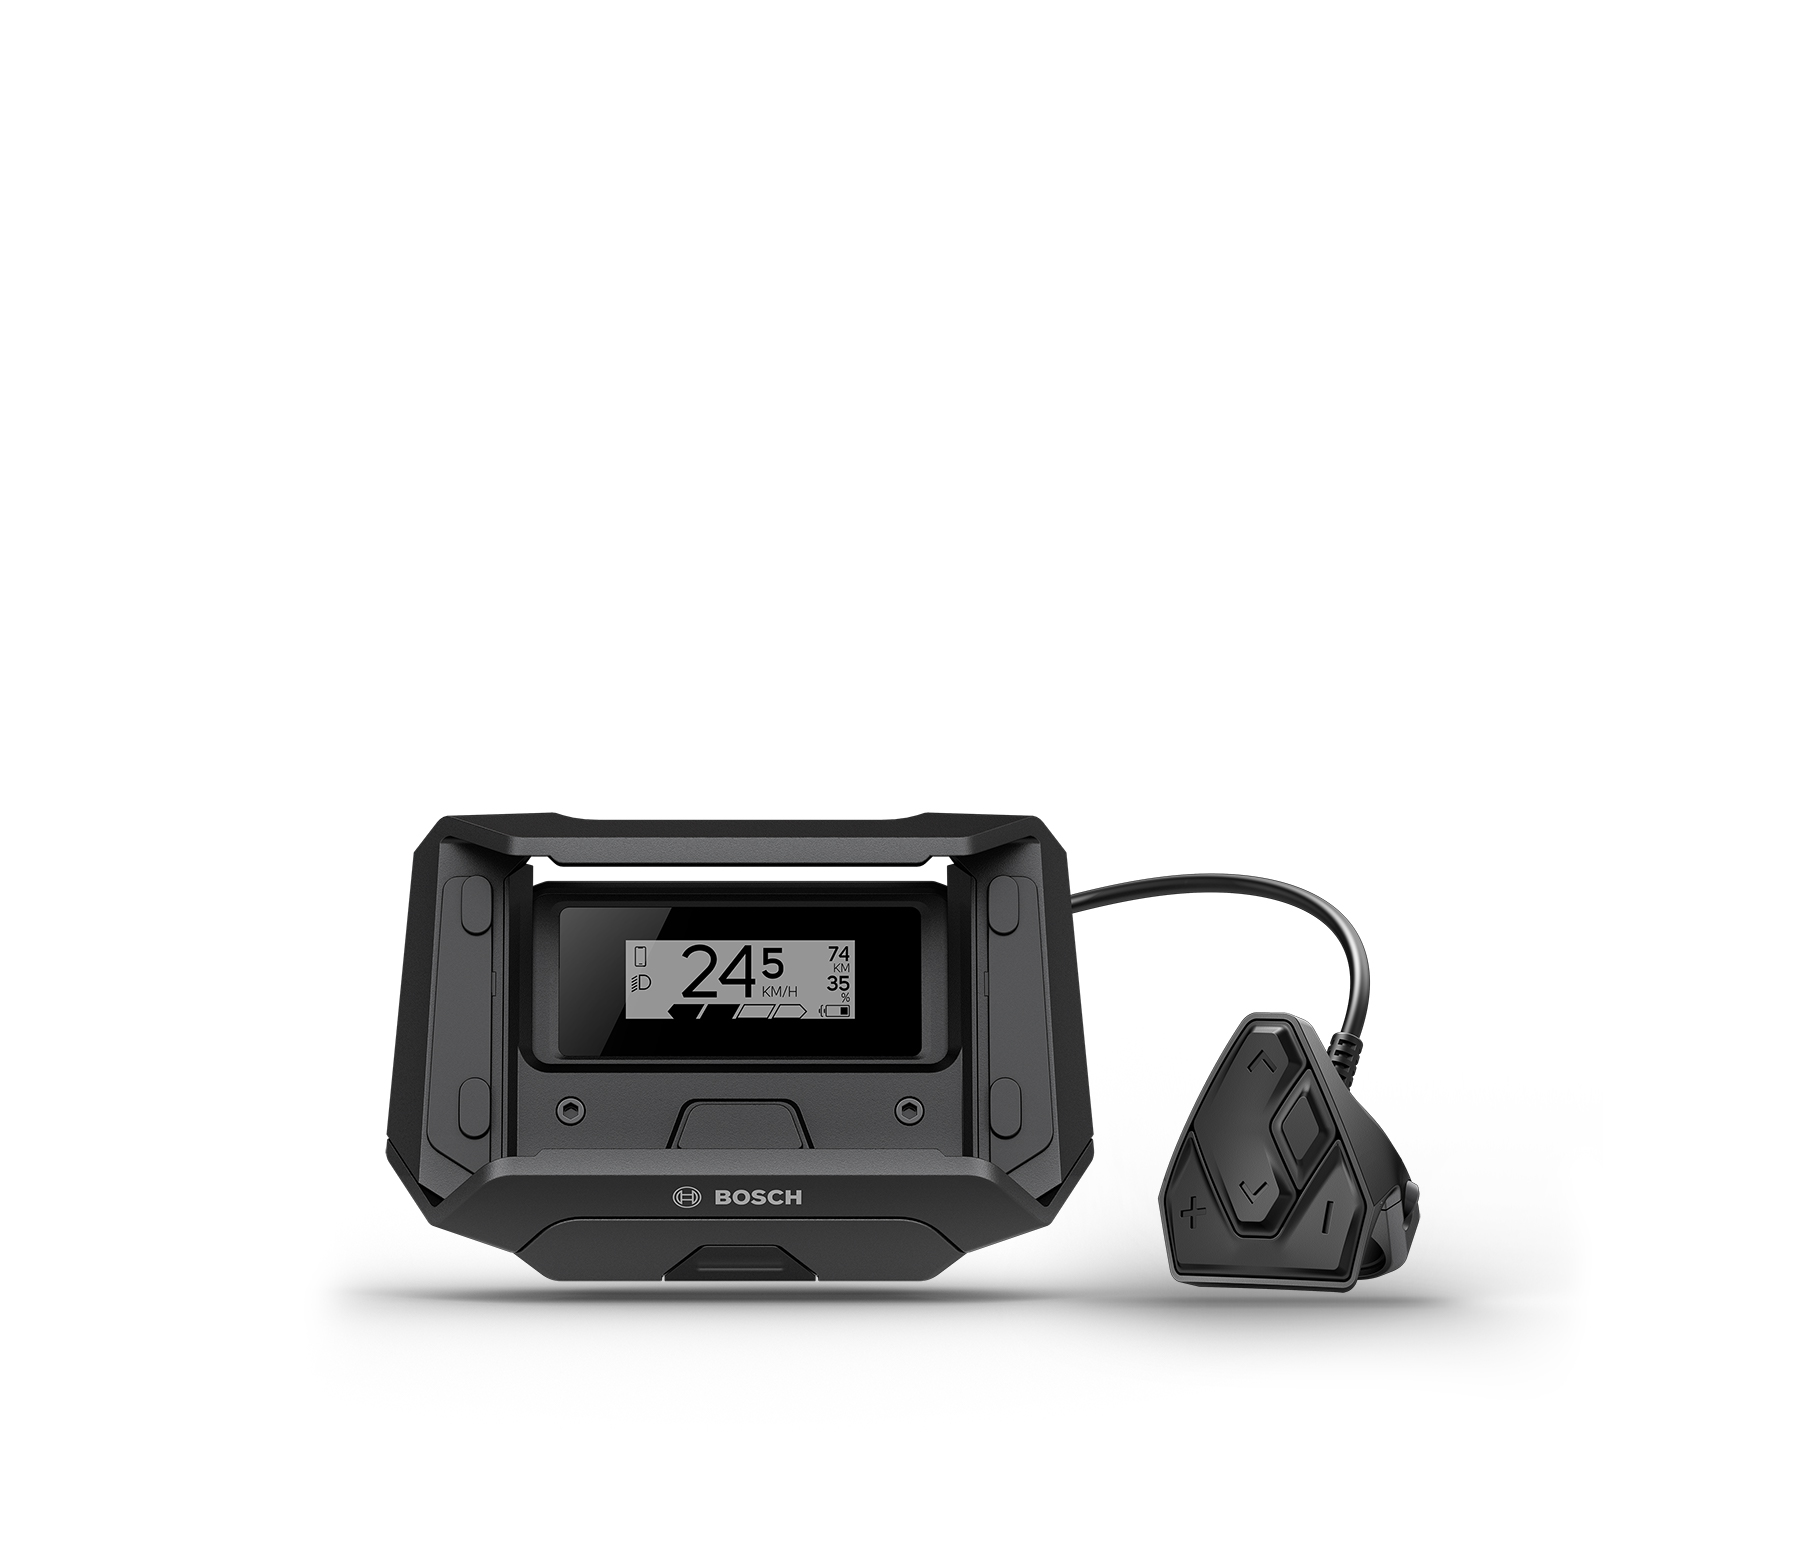 Bosch-eBike-SmartphoneHub-MY2020